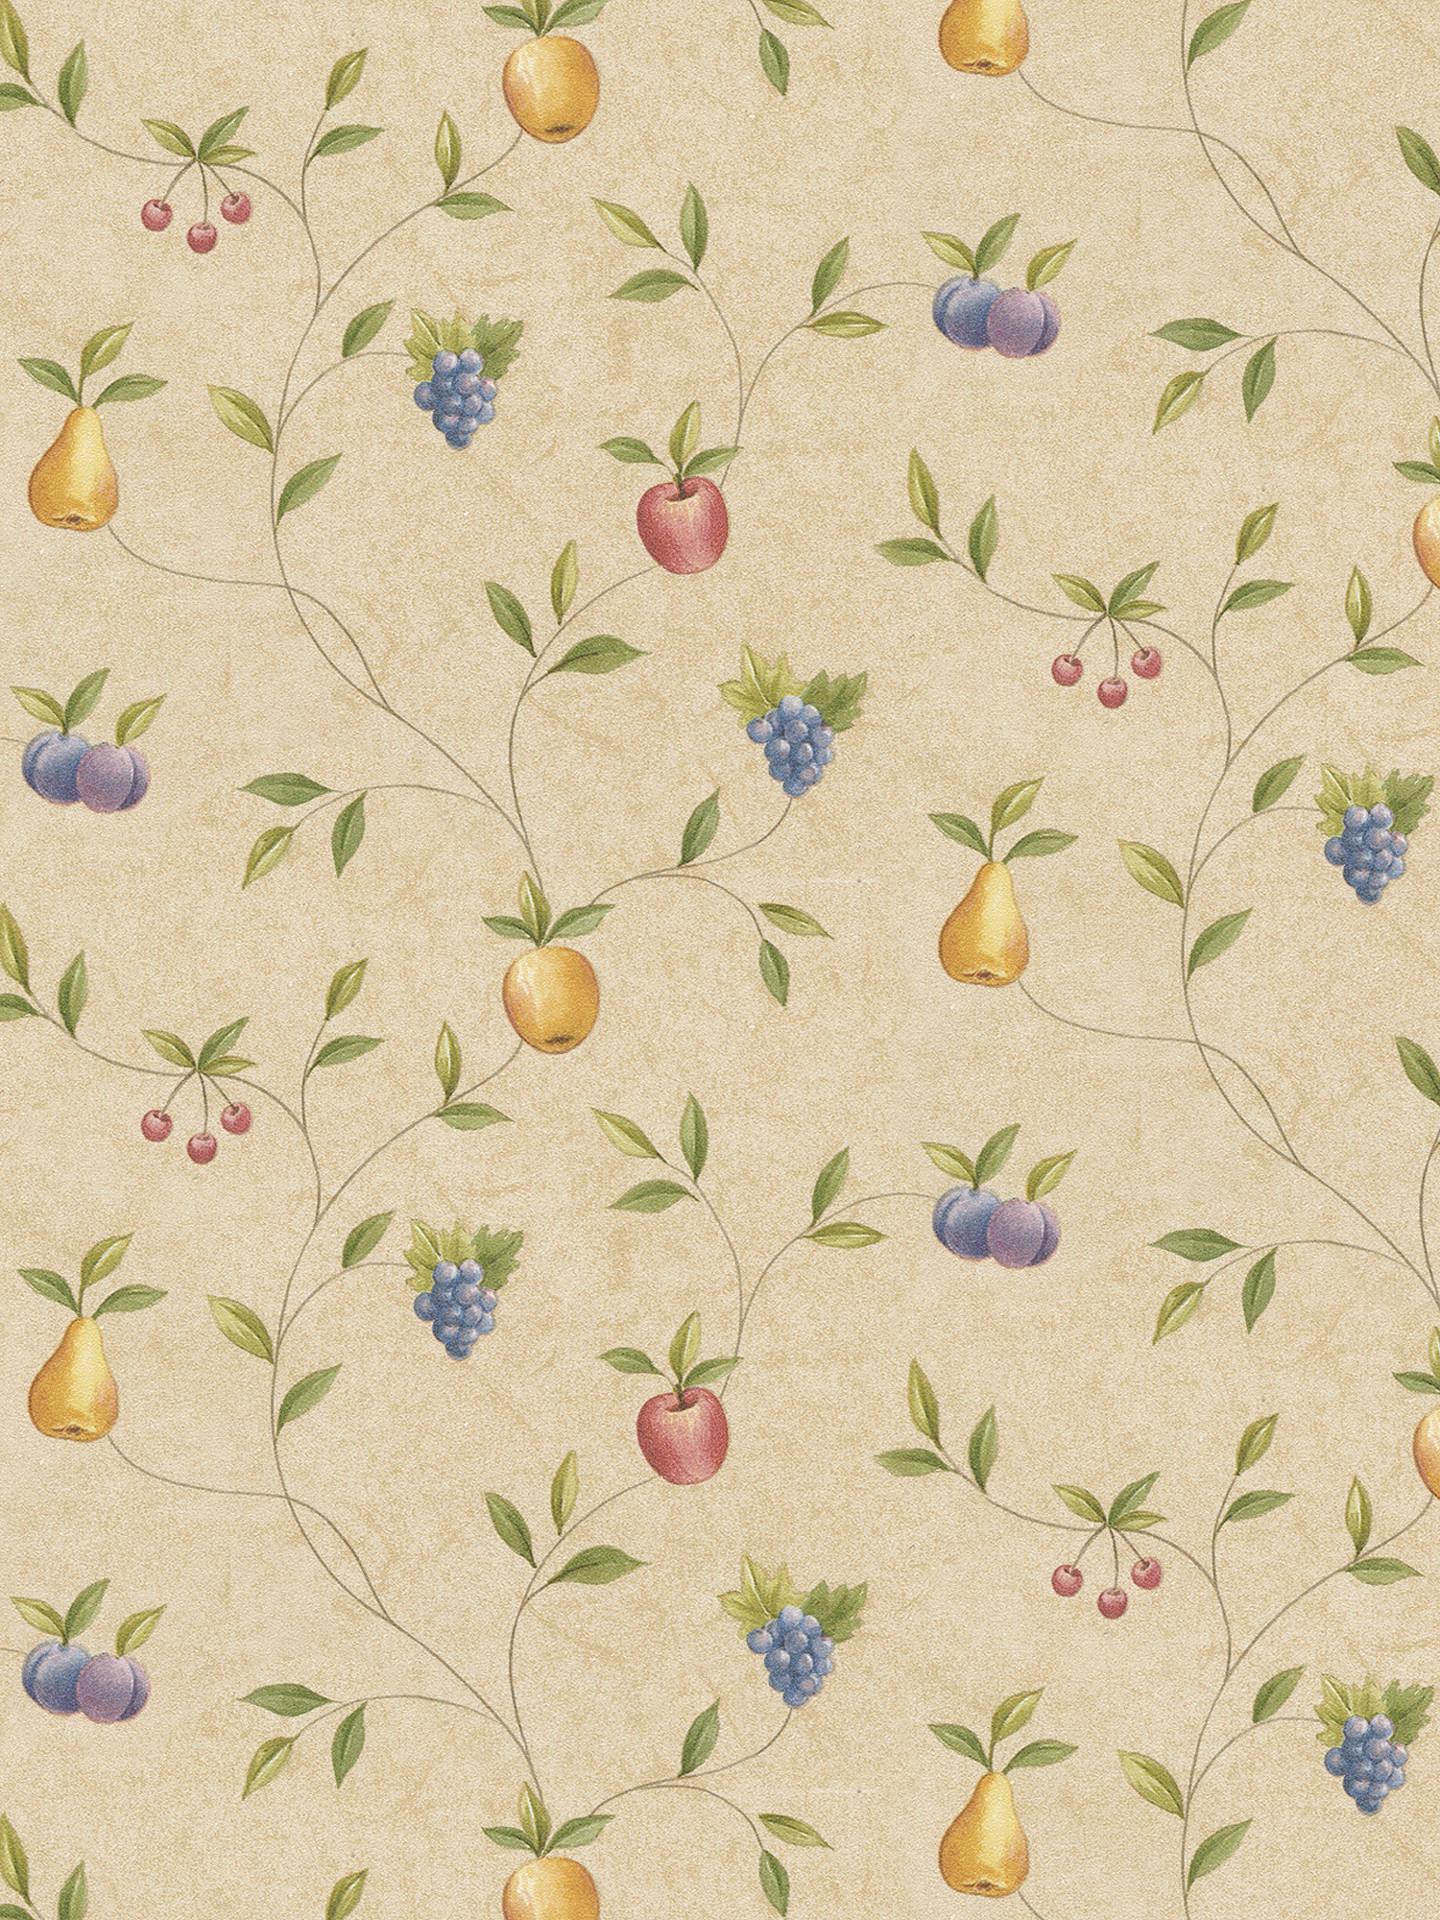 Galerie Fruit Trail Kitchen Wallpaper Natural Co25903 At John